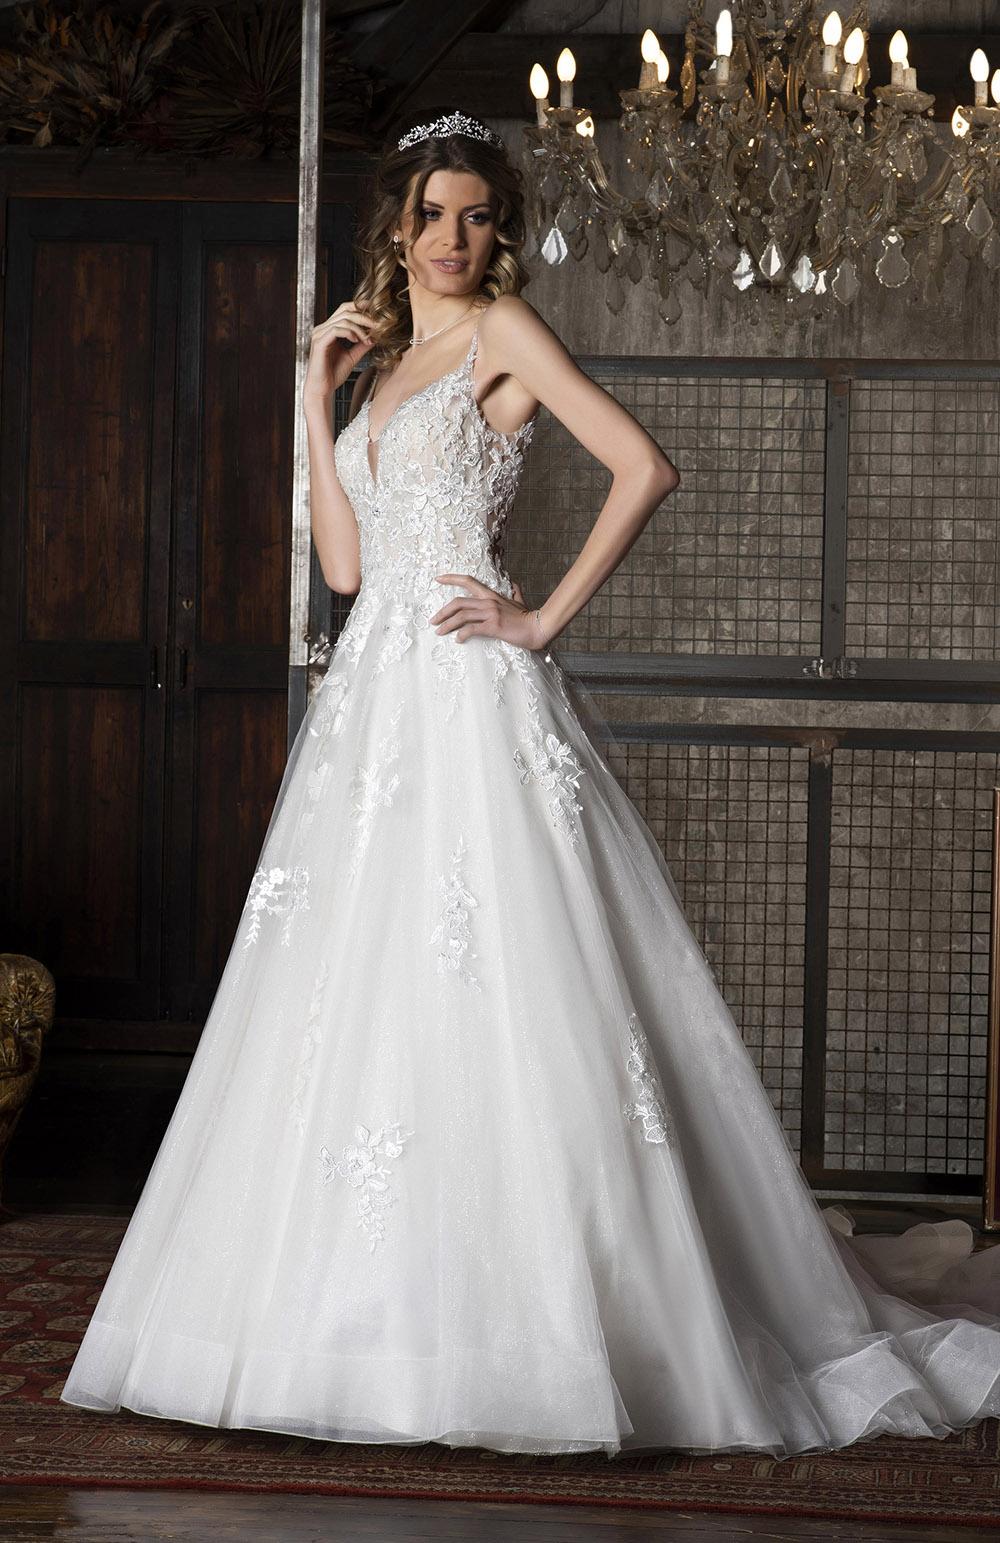 Robe de mariée Modèle Cybele